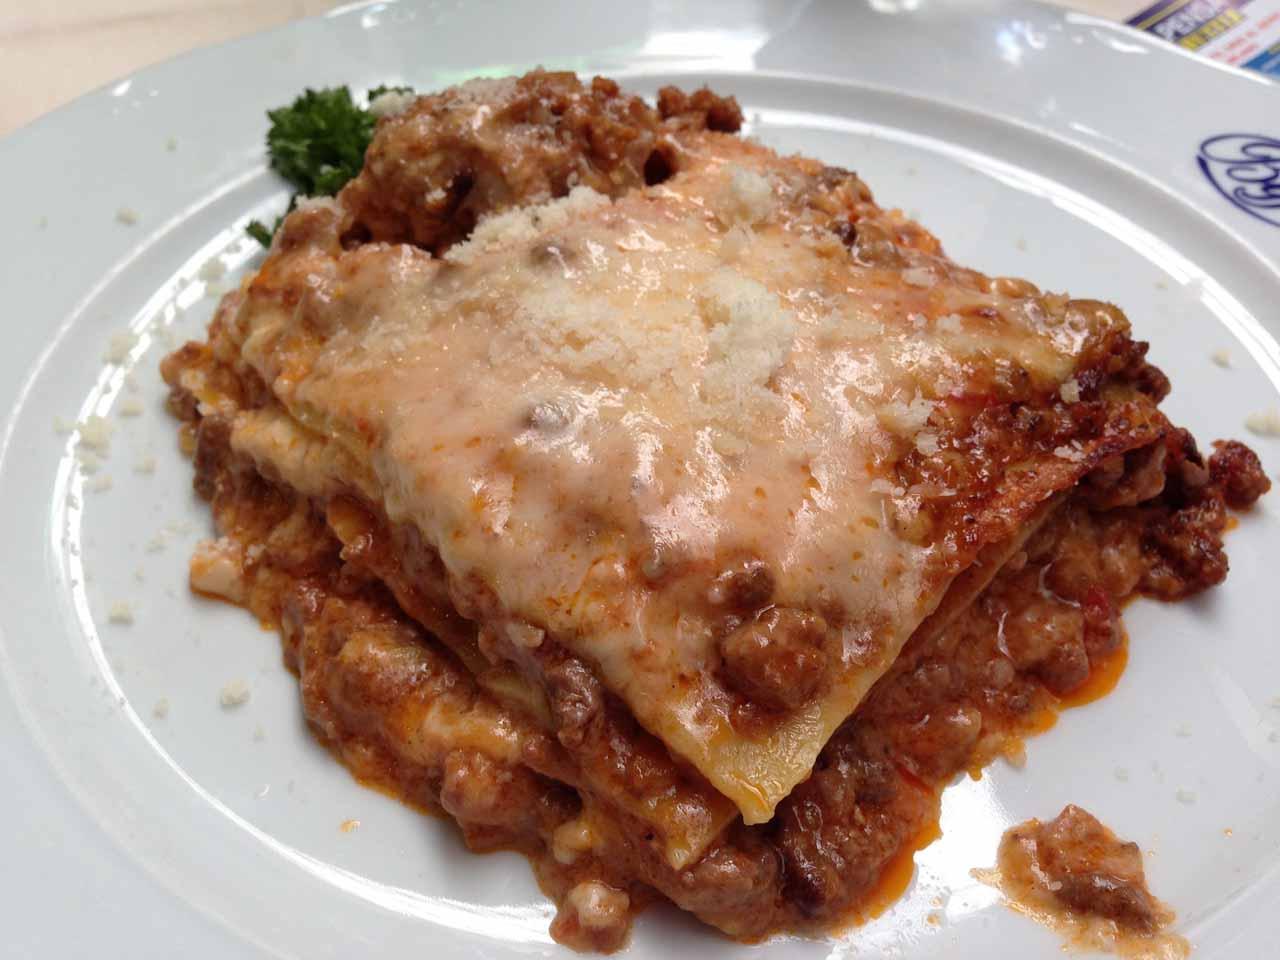 Julie's lasagna from Biffi's